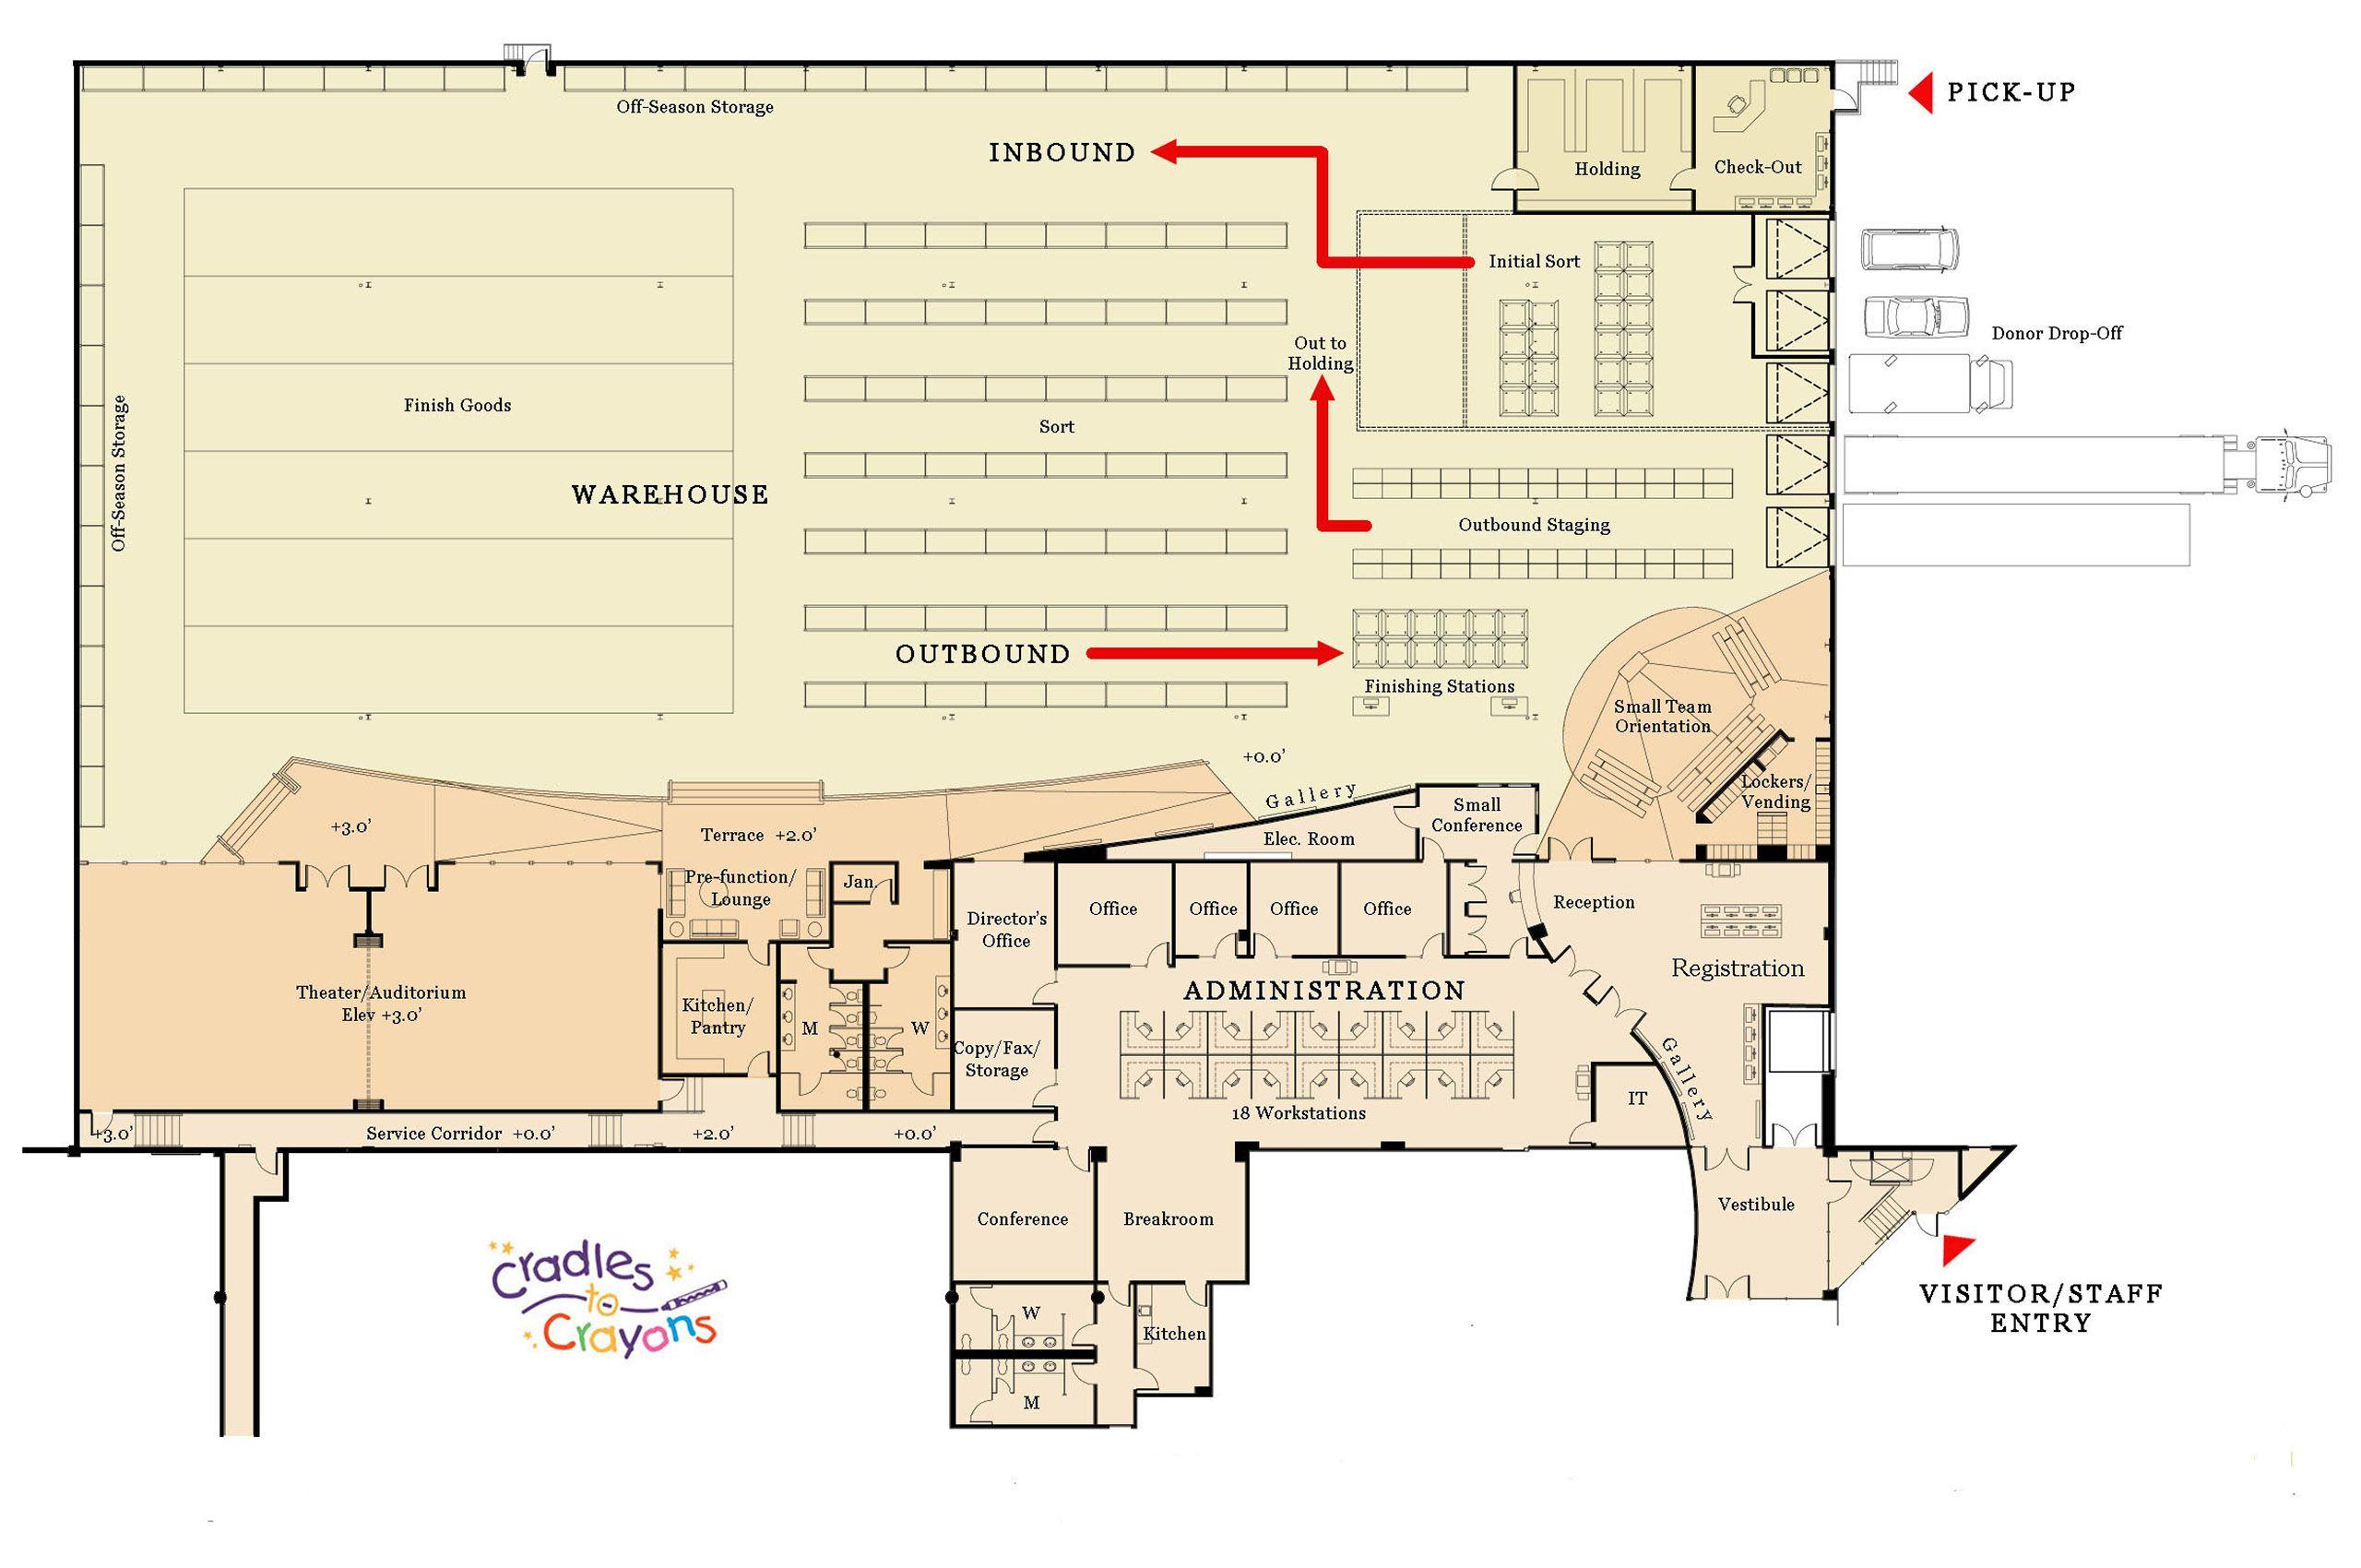 CradlesToCrayons-BrightonMA-Plan.jpg